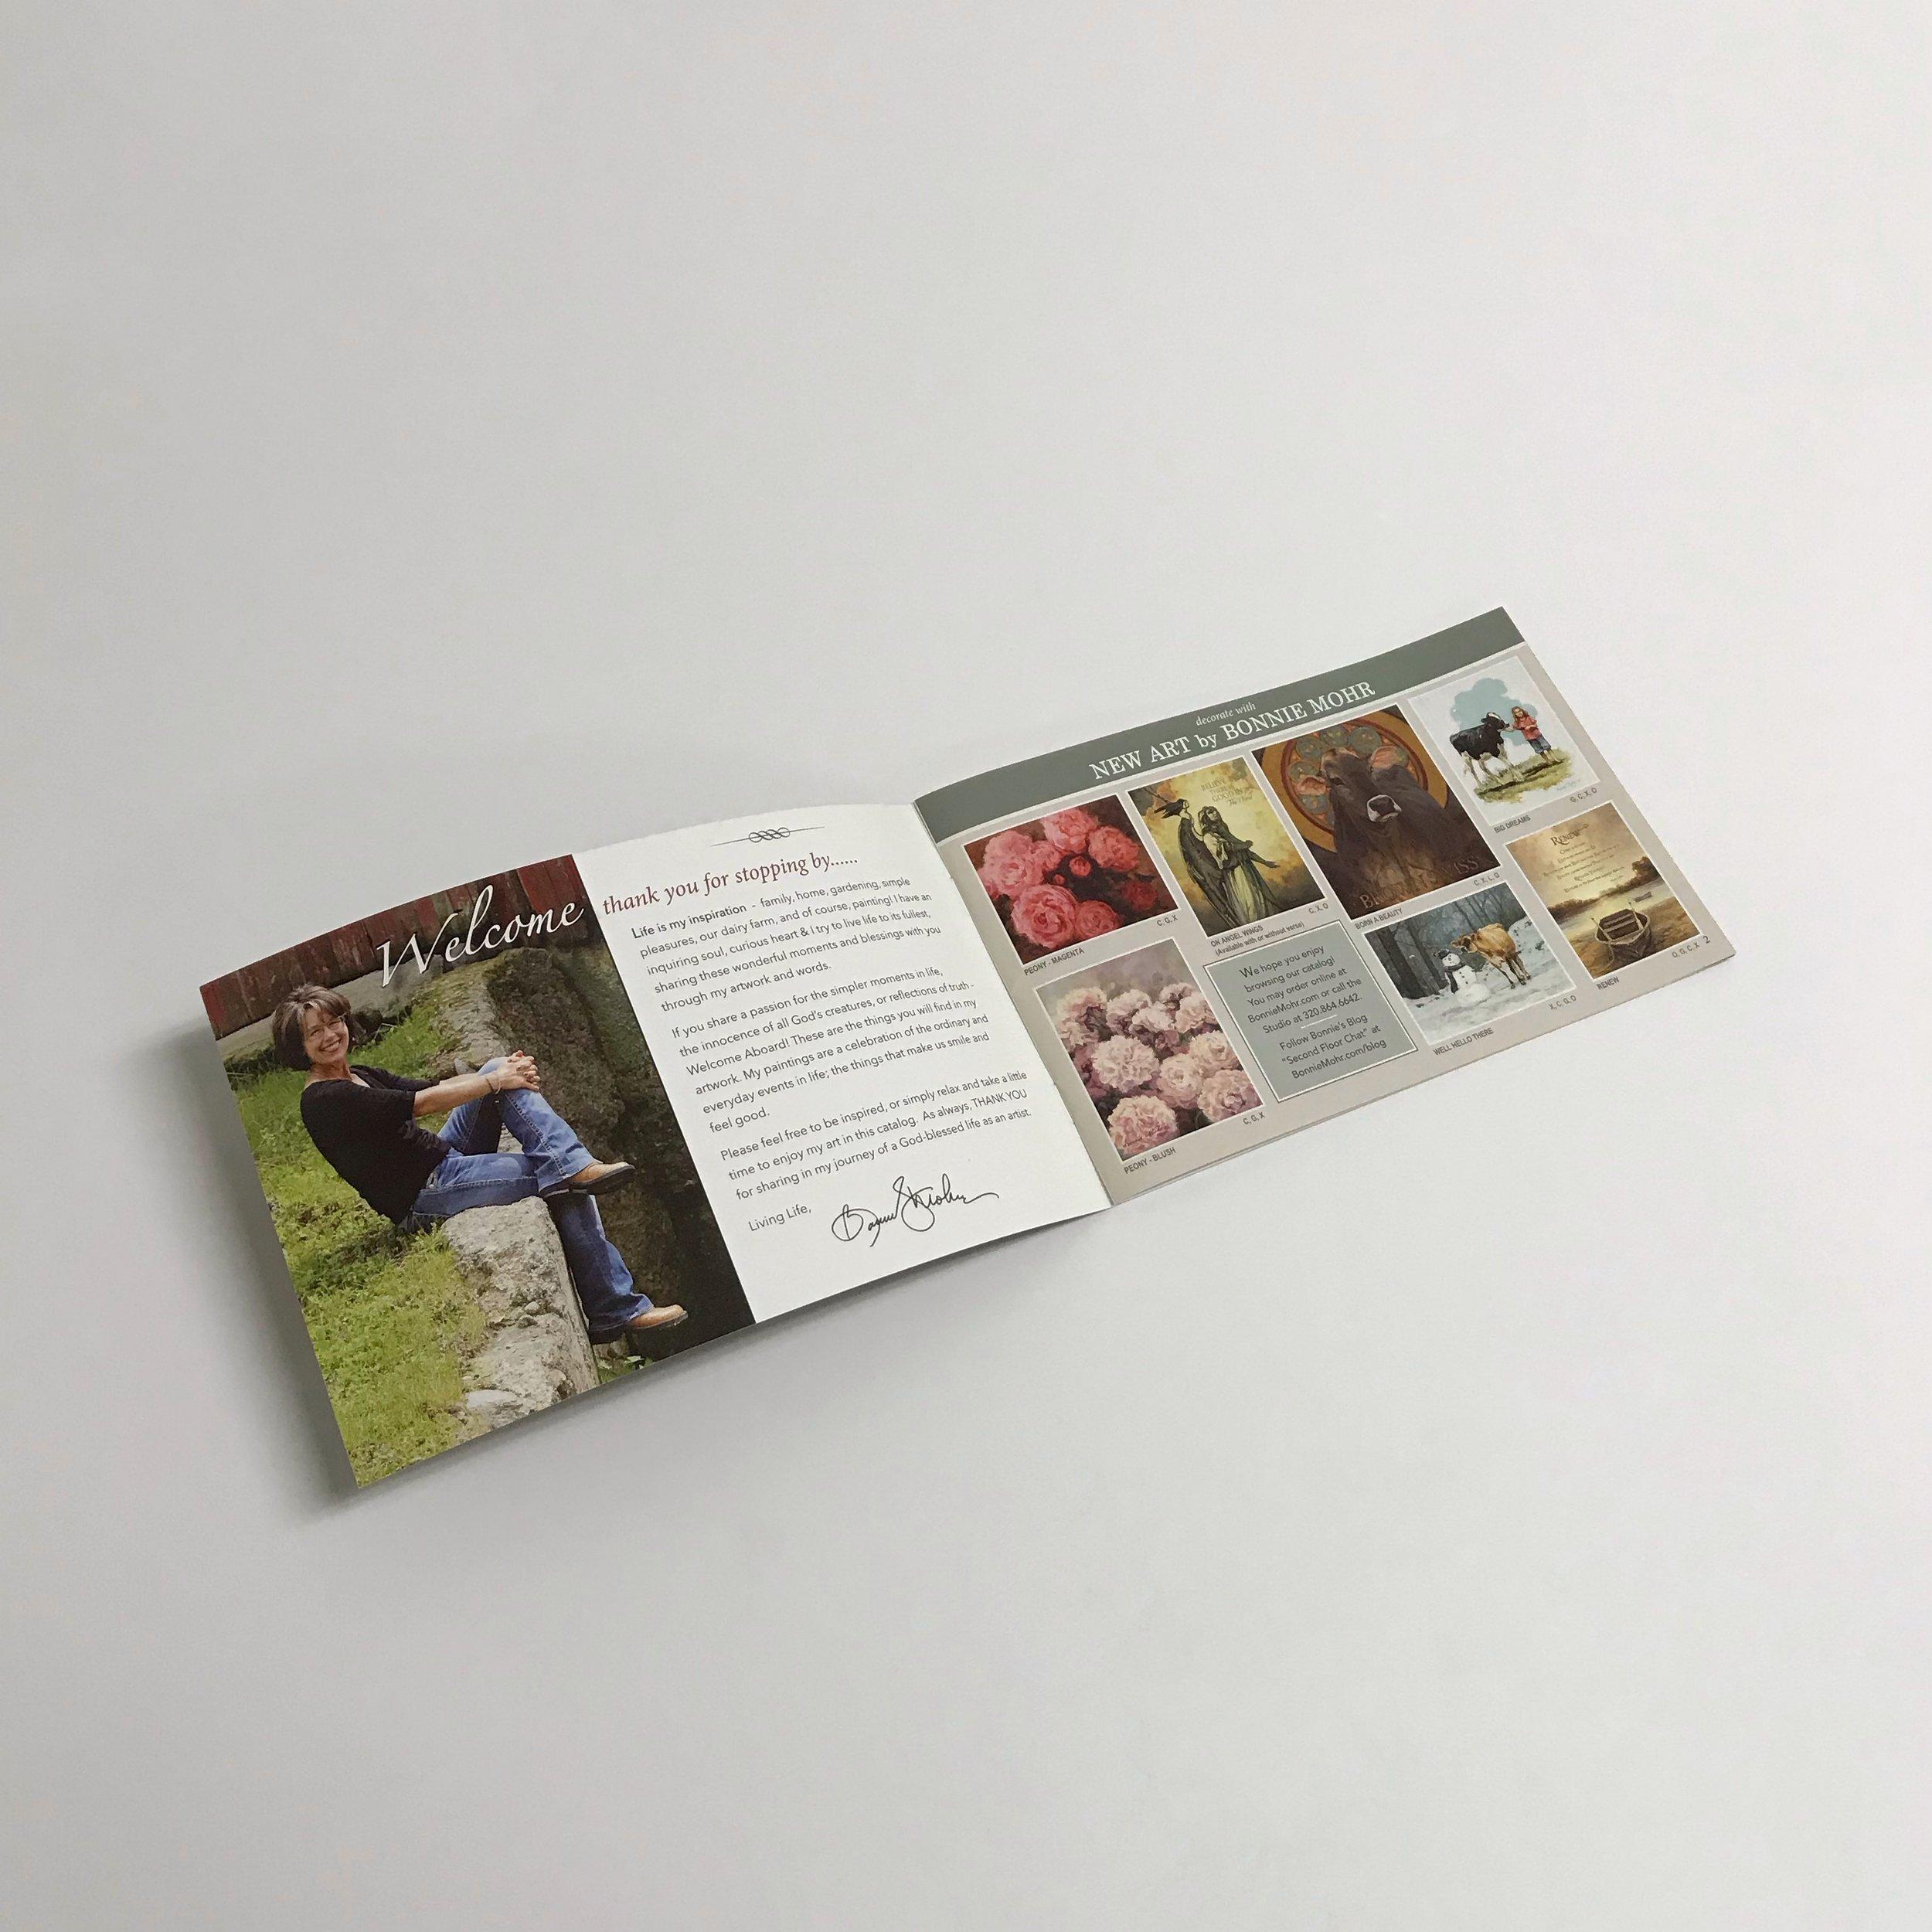 Booklet-Anderberg-Innovative-Print Solutions-Twin-Cities.JPG